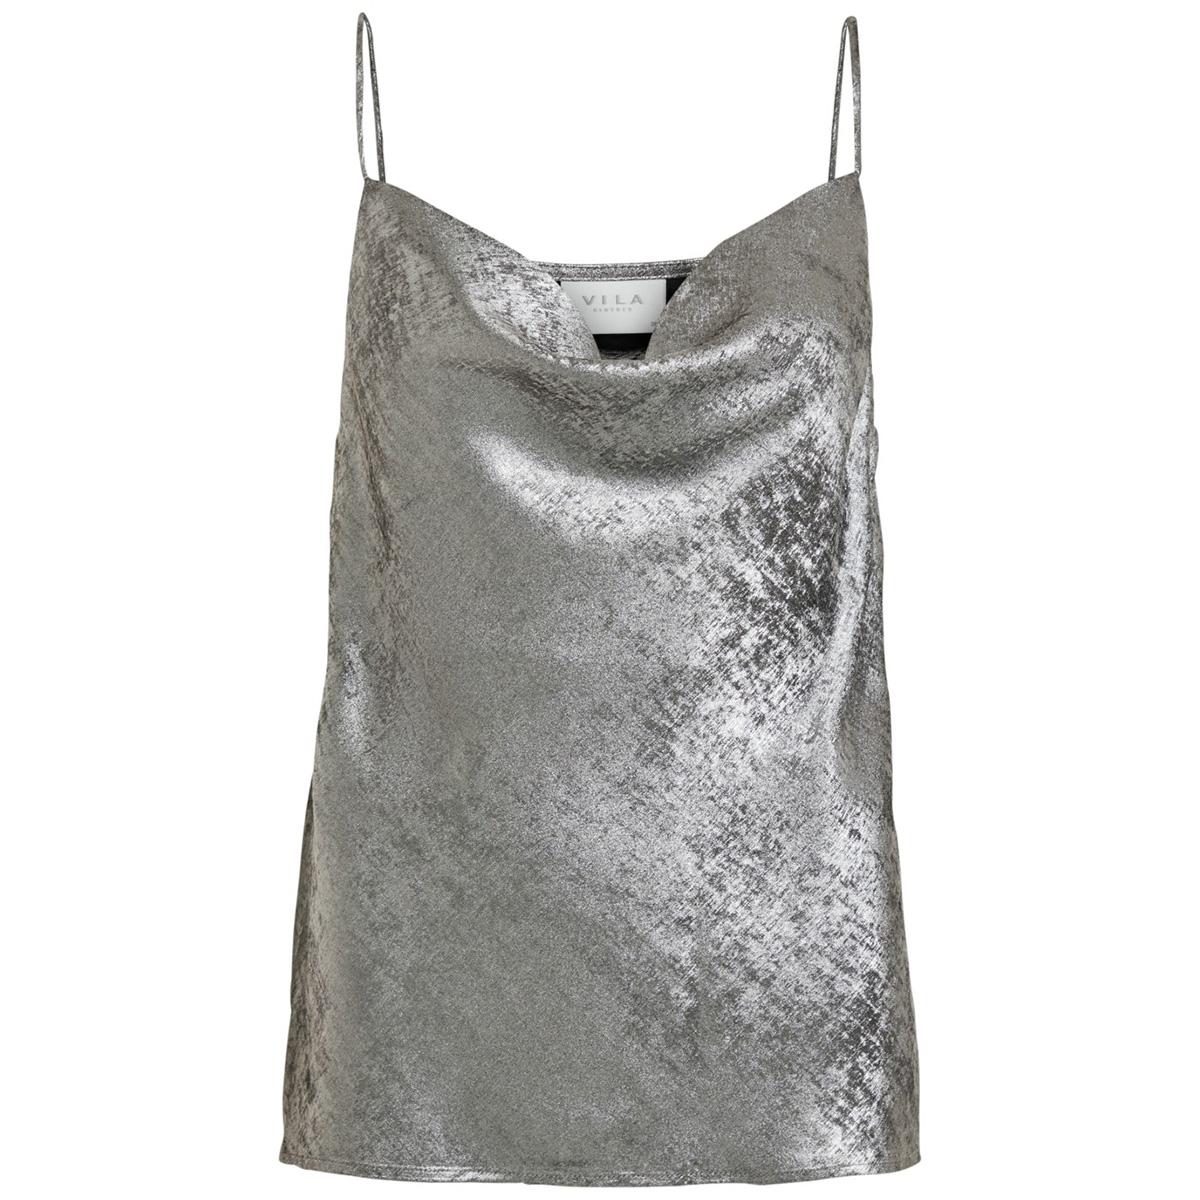 viopal singlet 14056770 vila top silver